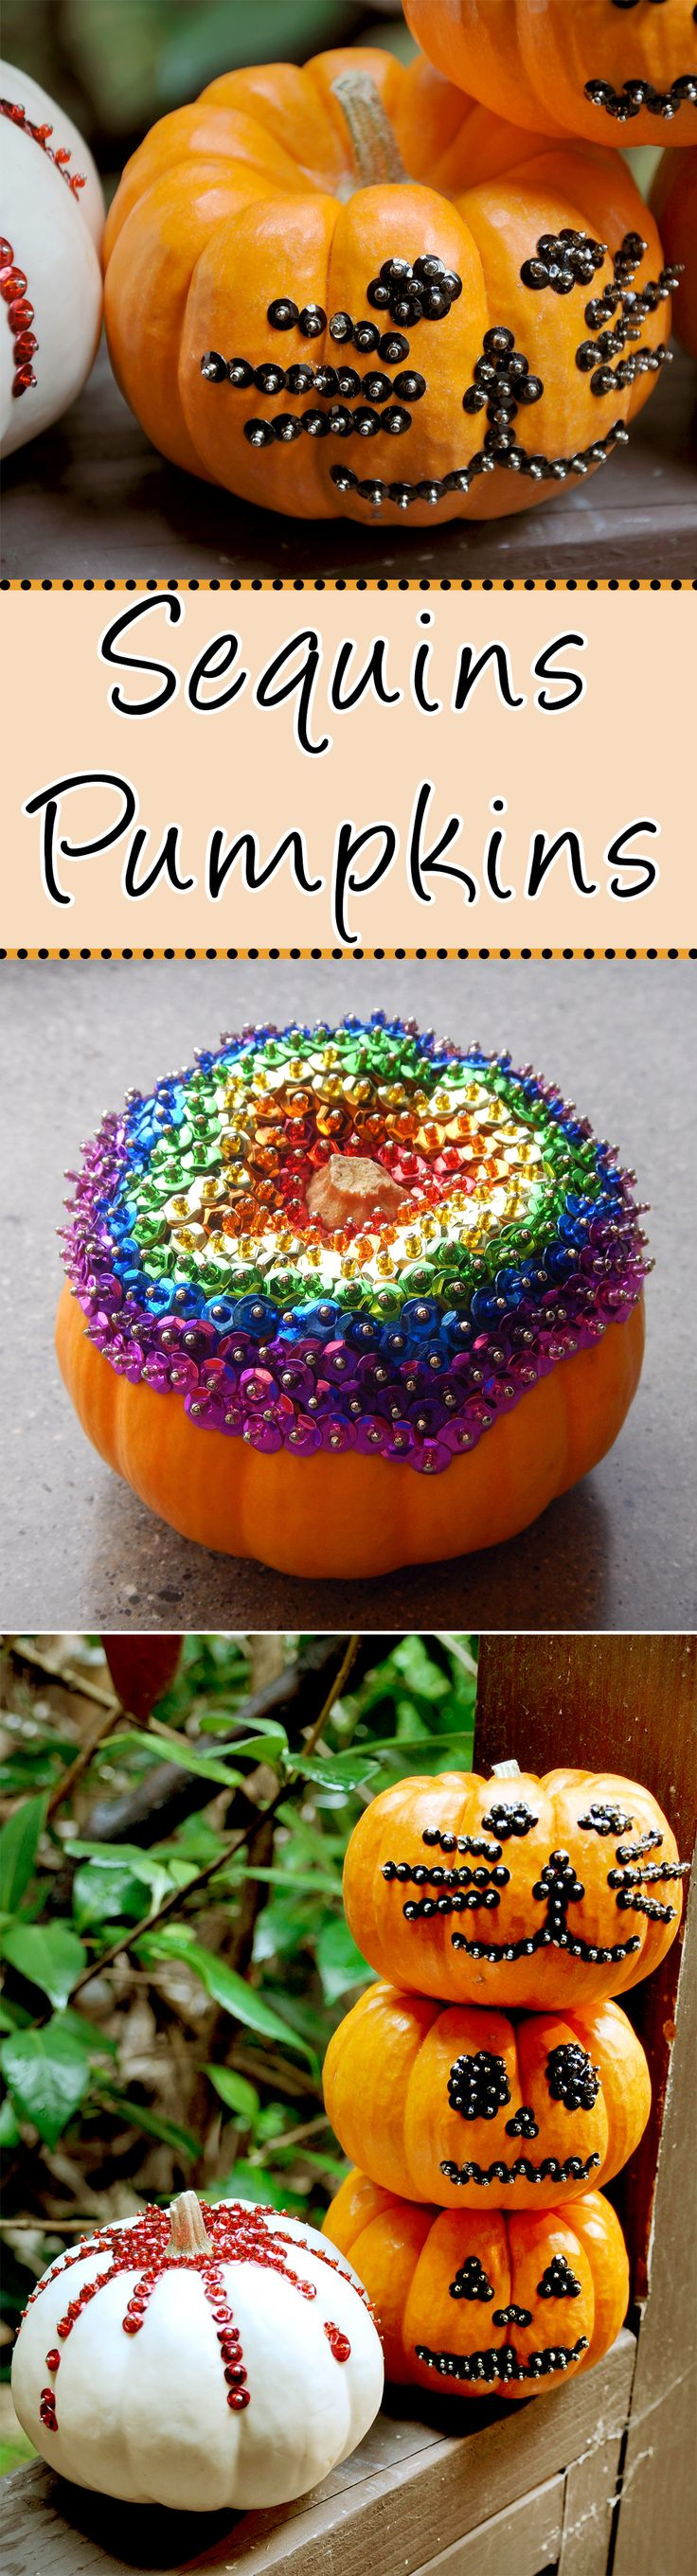 146 best Halloween Decorations images on Pinterest